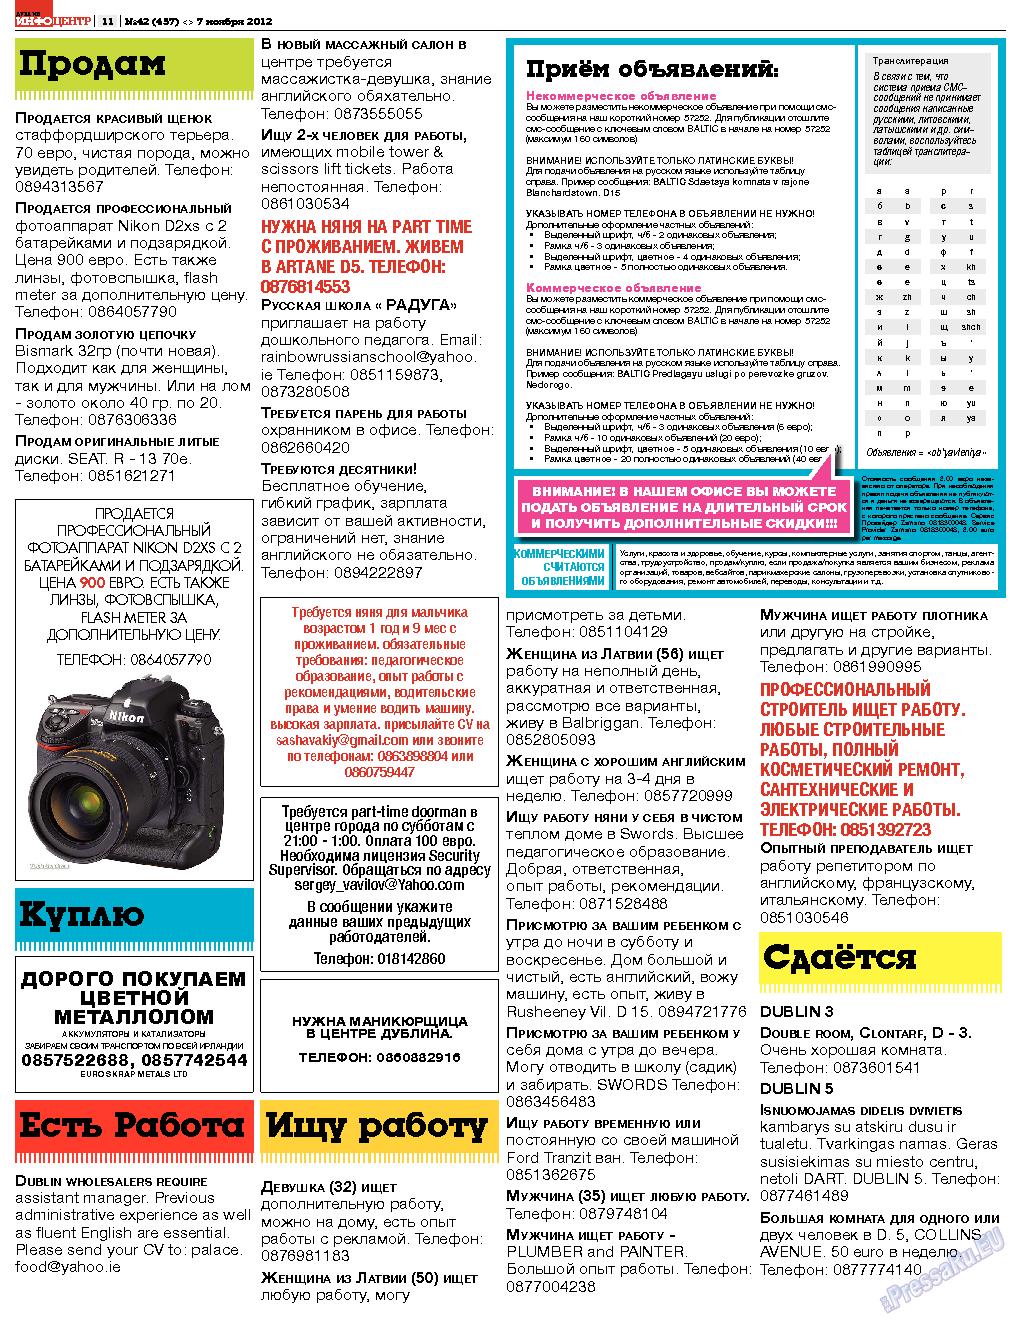 Дублин инфоцентр (газета). 2012 год, номер 42, стр. 11